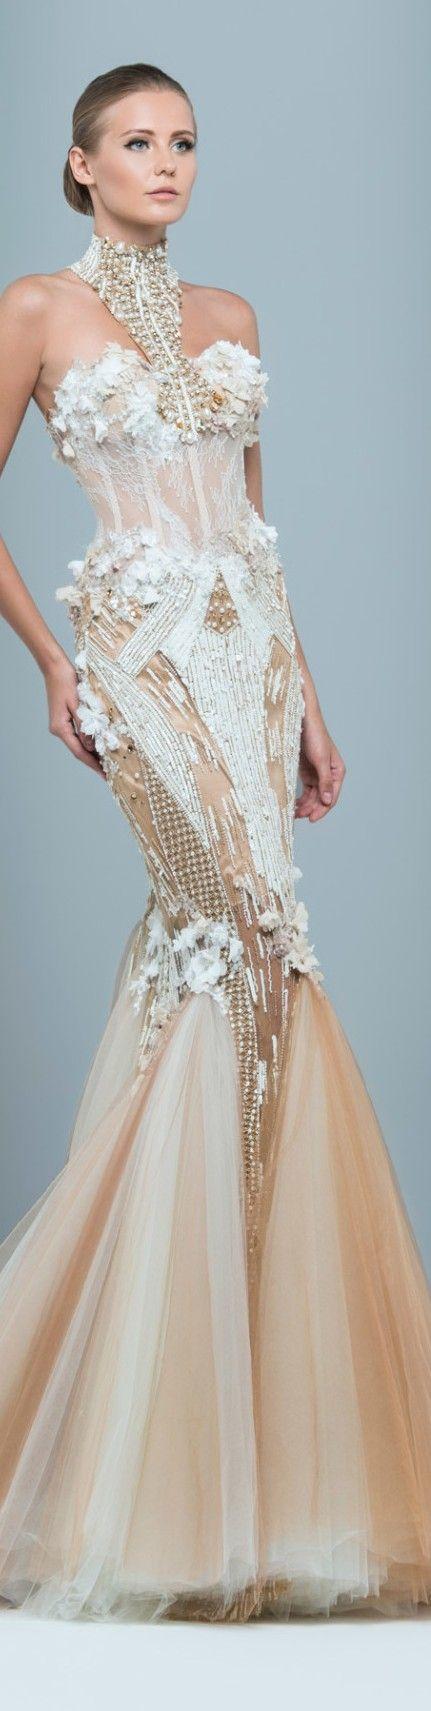 Texture!!  Marwan & Khaled couture 2015 ❤